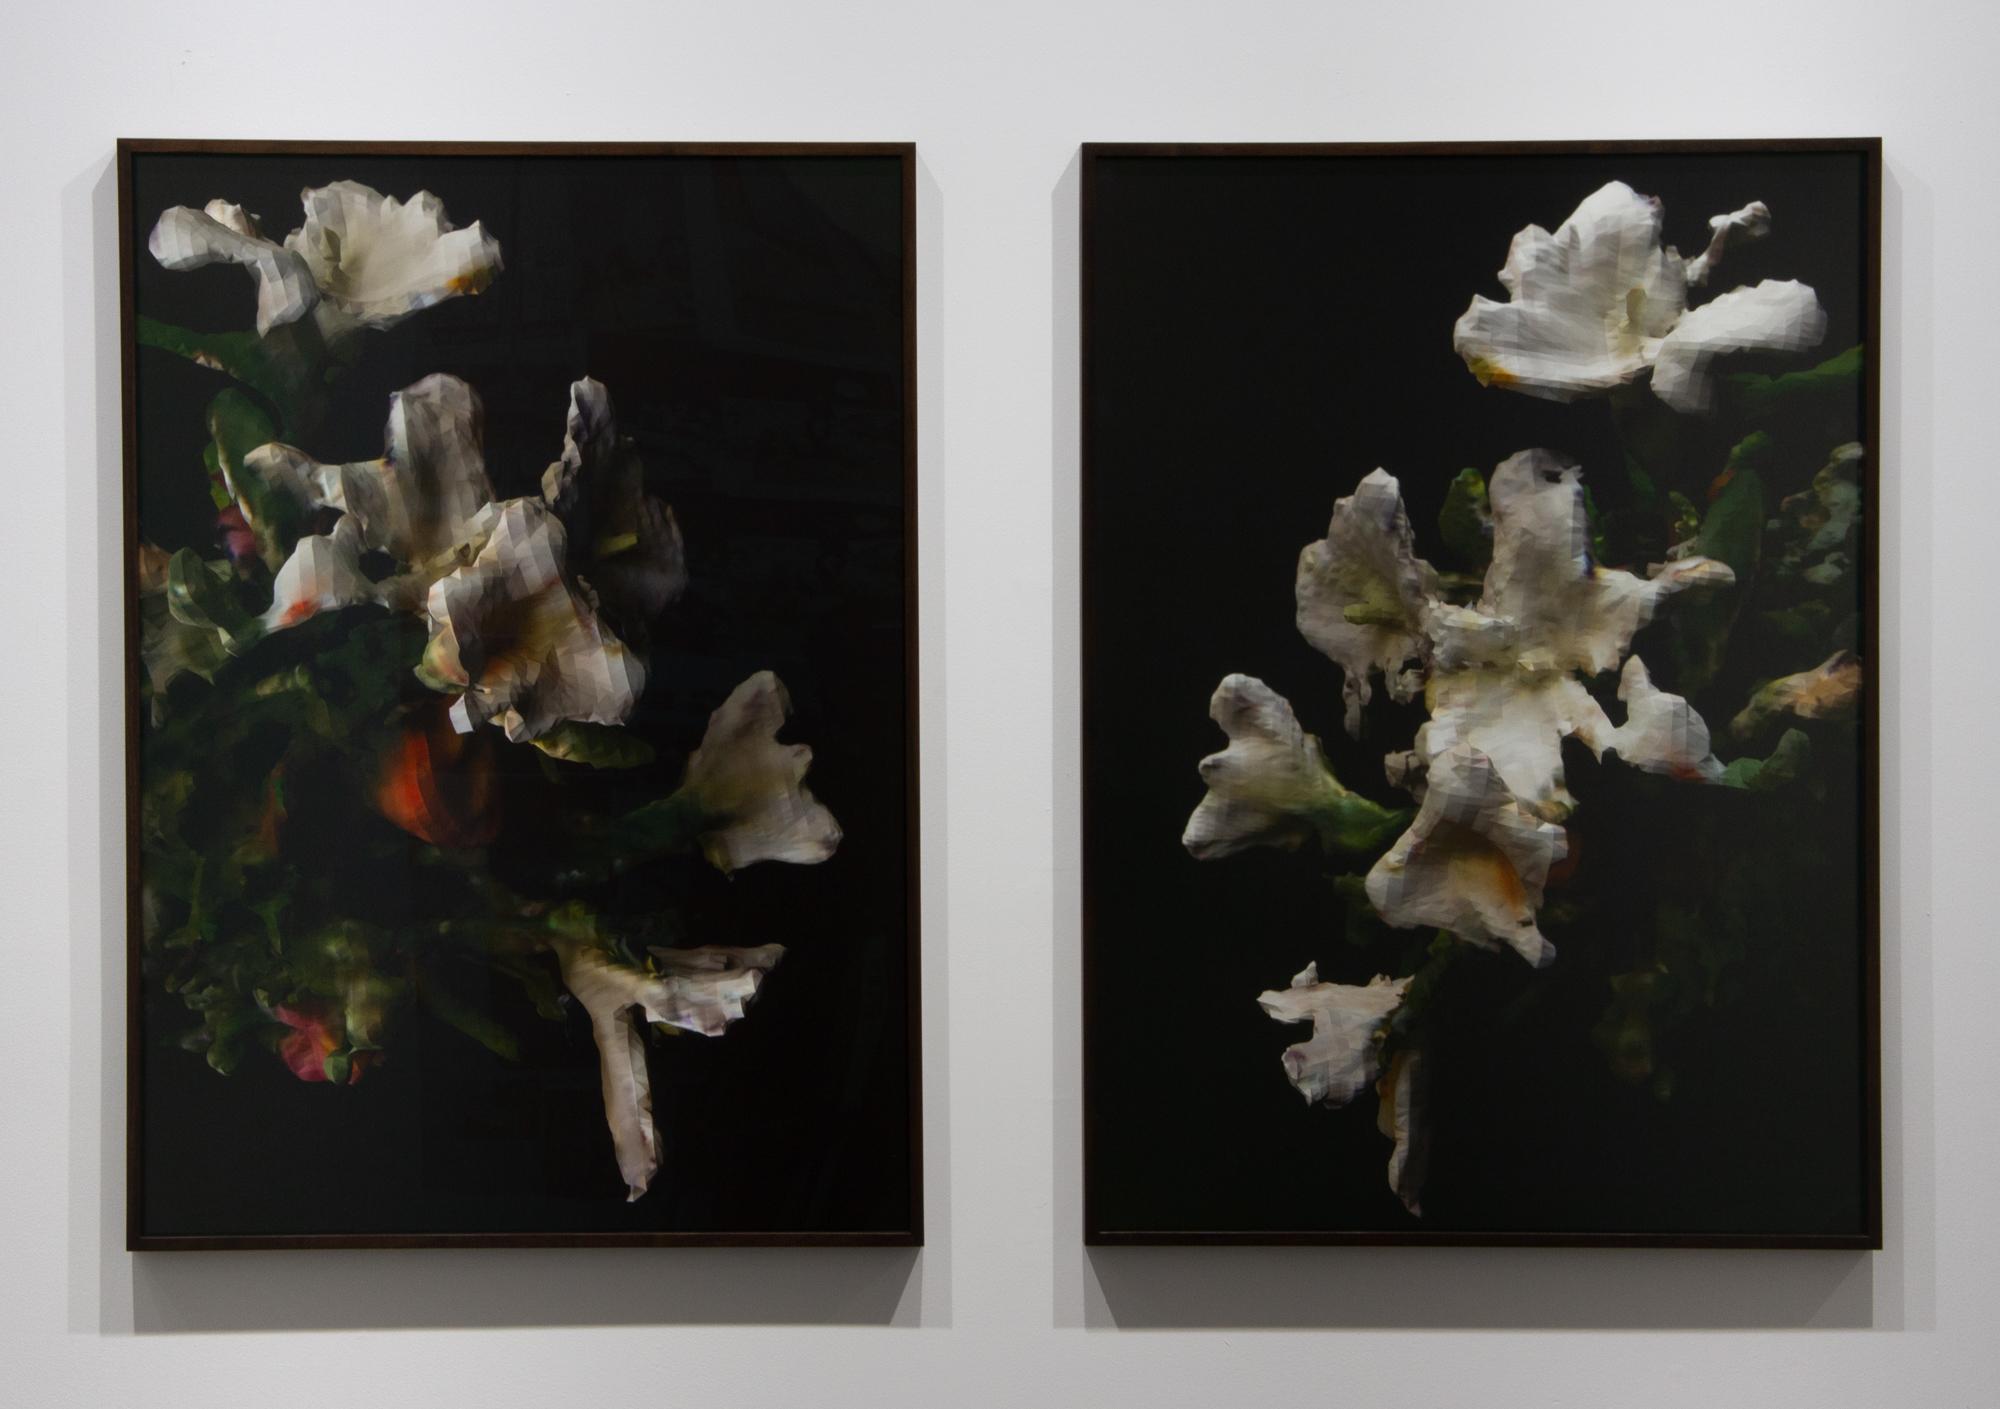 Rhonda Holberton, Left:  Lilium Candidum, Rosa 'Madame A. Meilland', Alstroemeria (Night I),  2018, Archival Pigment Print, 28 x 39 in. (framed), ed. of 3 + 2 A.P. Right:  Lilium Candidum, Rosa 'Madame A. Meilland', Alstroemeria (Night II) , 2018, Archival Pigment Print, 28 x 39 in. (framed), ed. of 3 + 2 A.P.